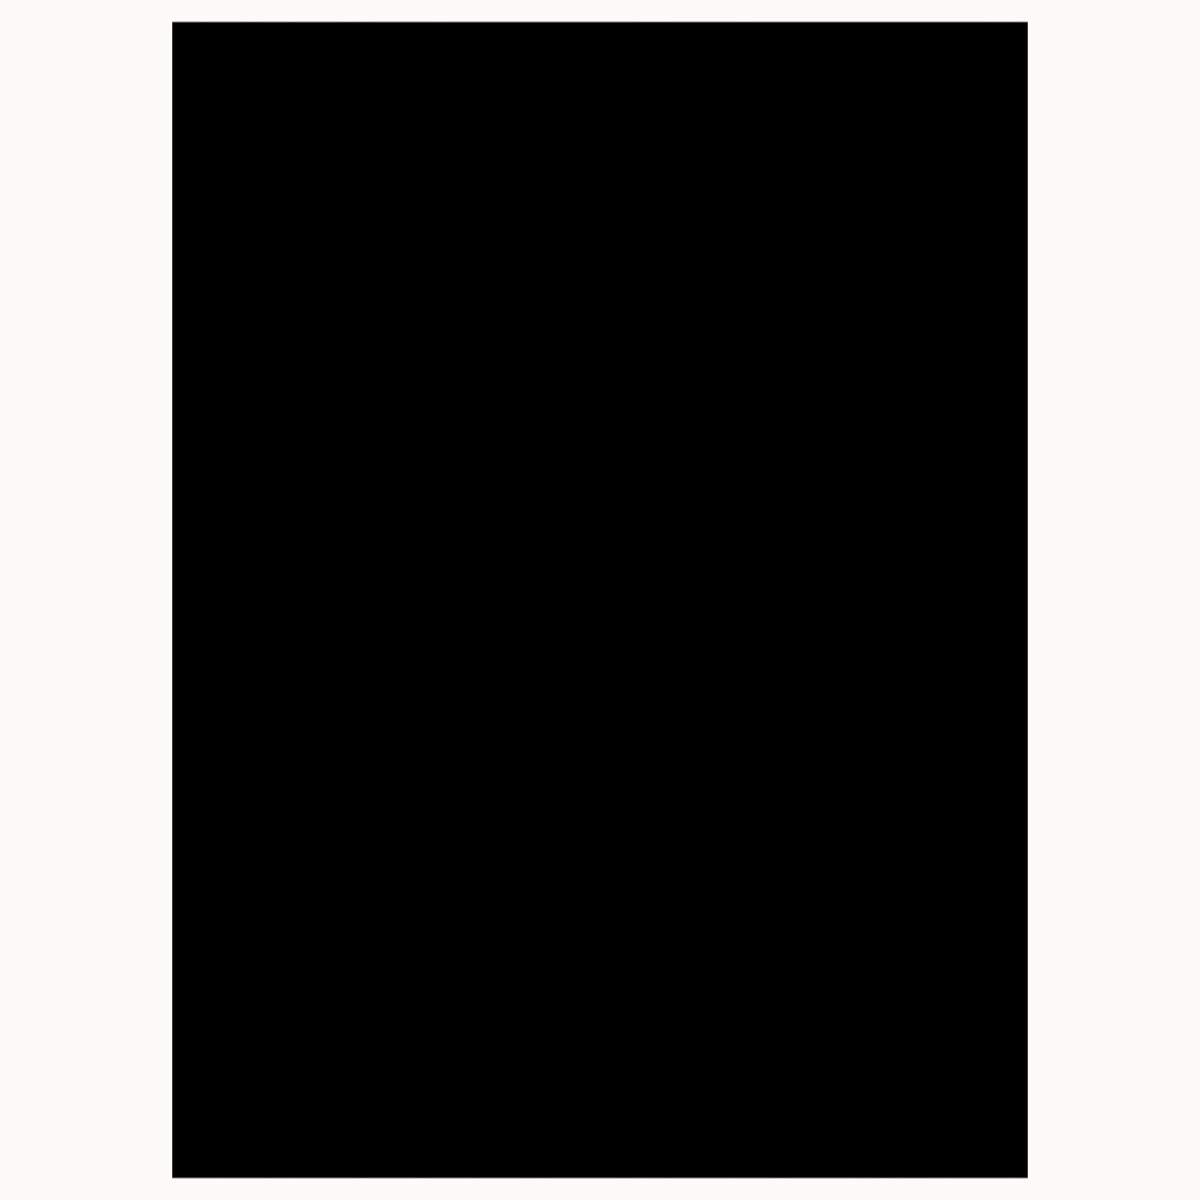 cooja opaque film fenetre occultant non adhesif anti uv. Black Bedroom Furniture Sets. Home Design Ideas